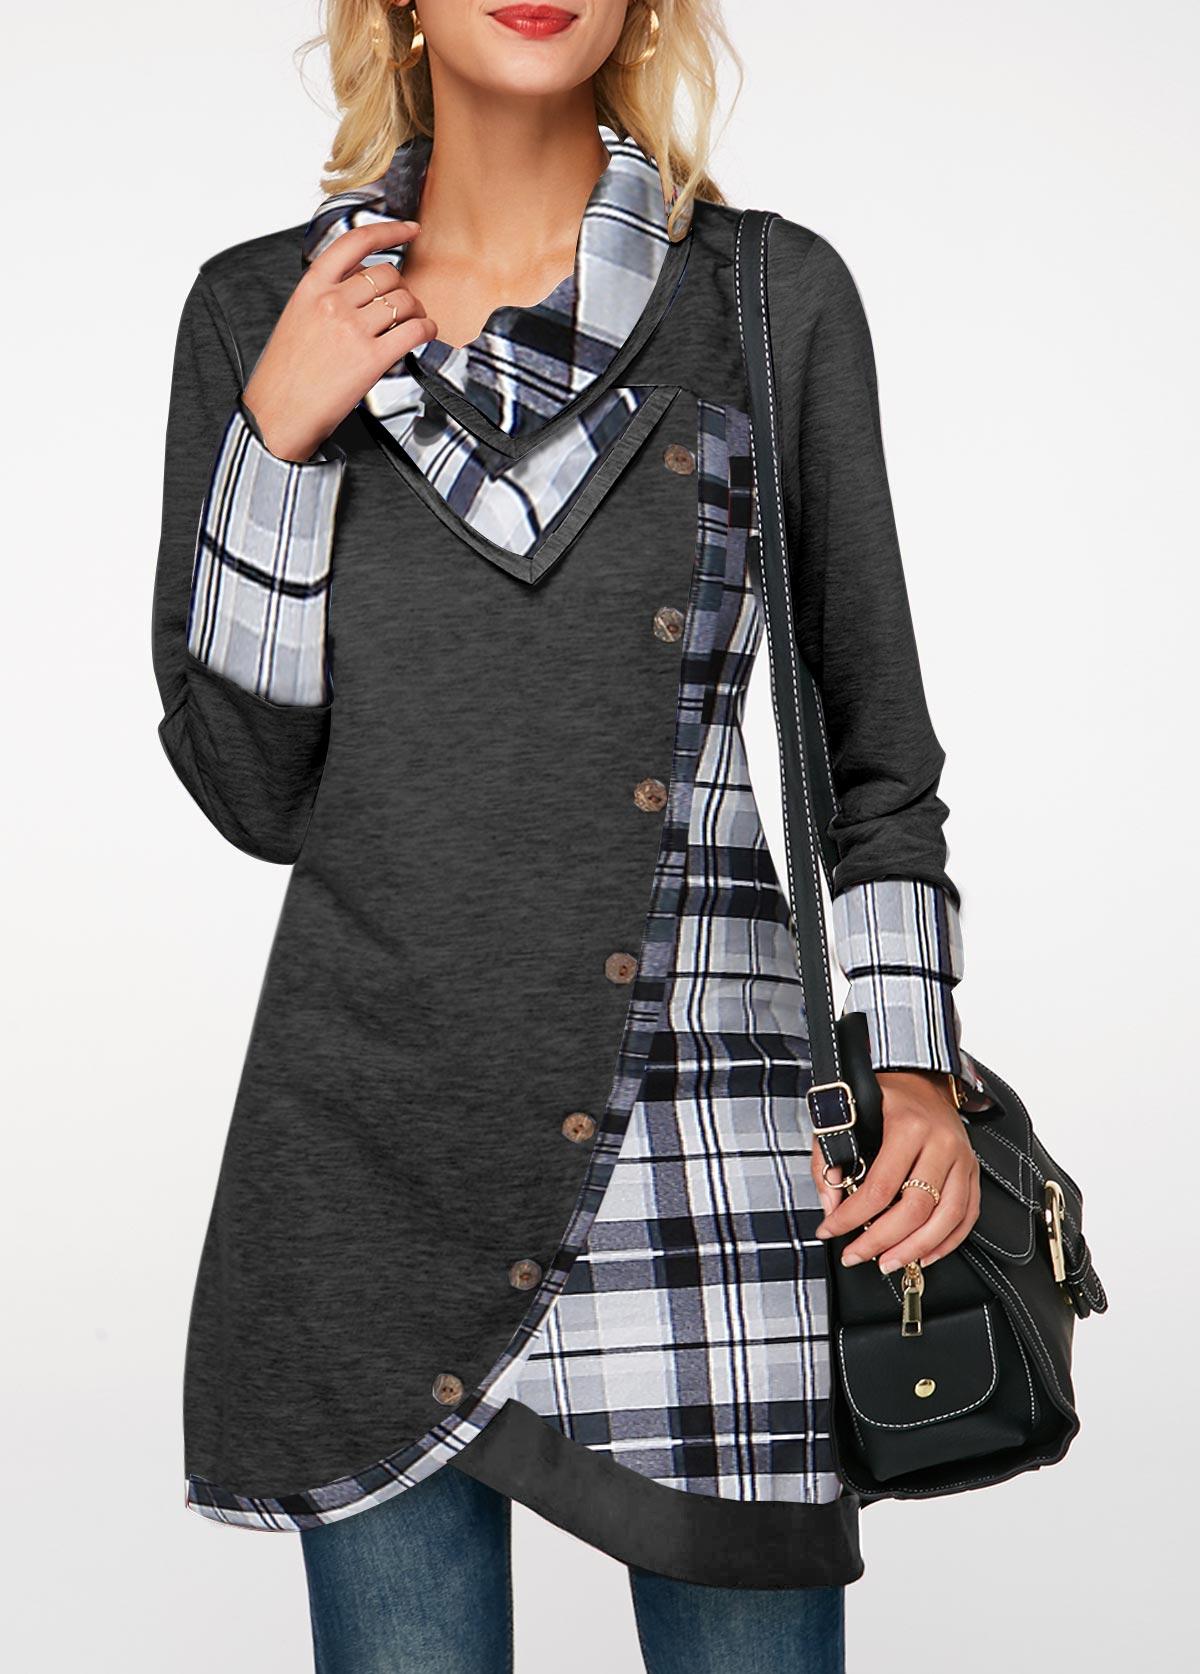 Plaid Print Inclined Button Turndown Collar Sweatshirt